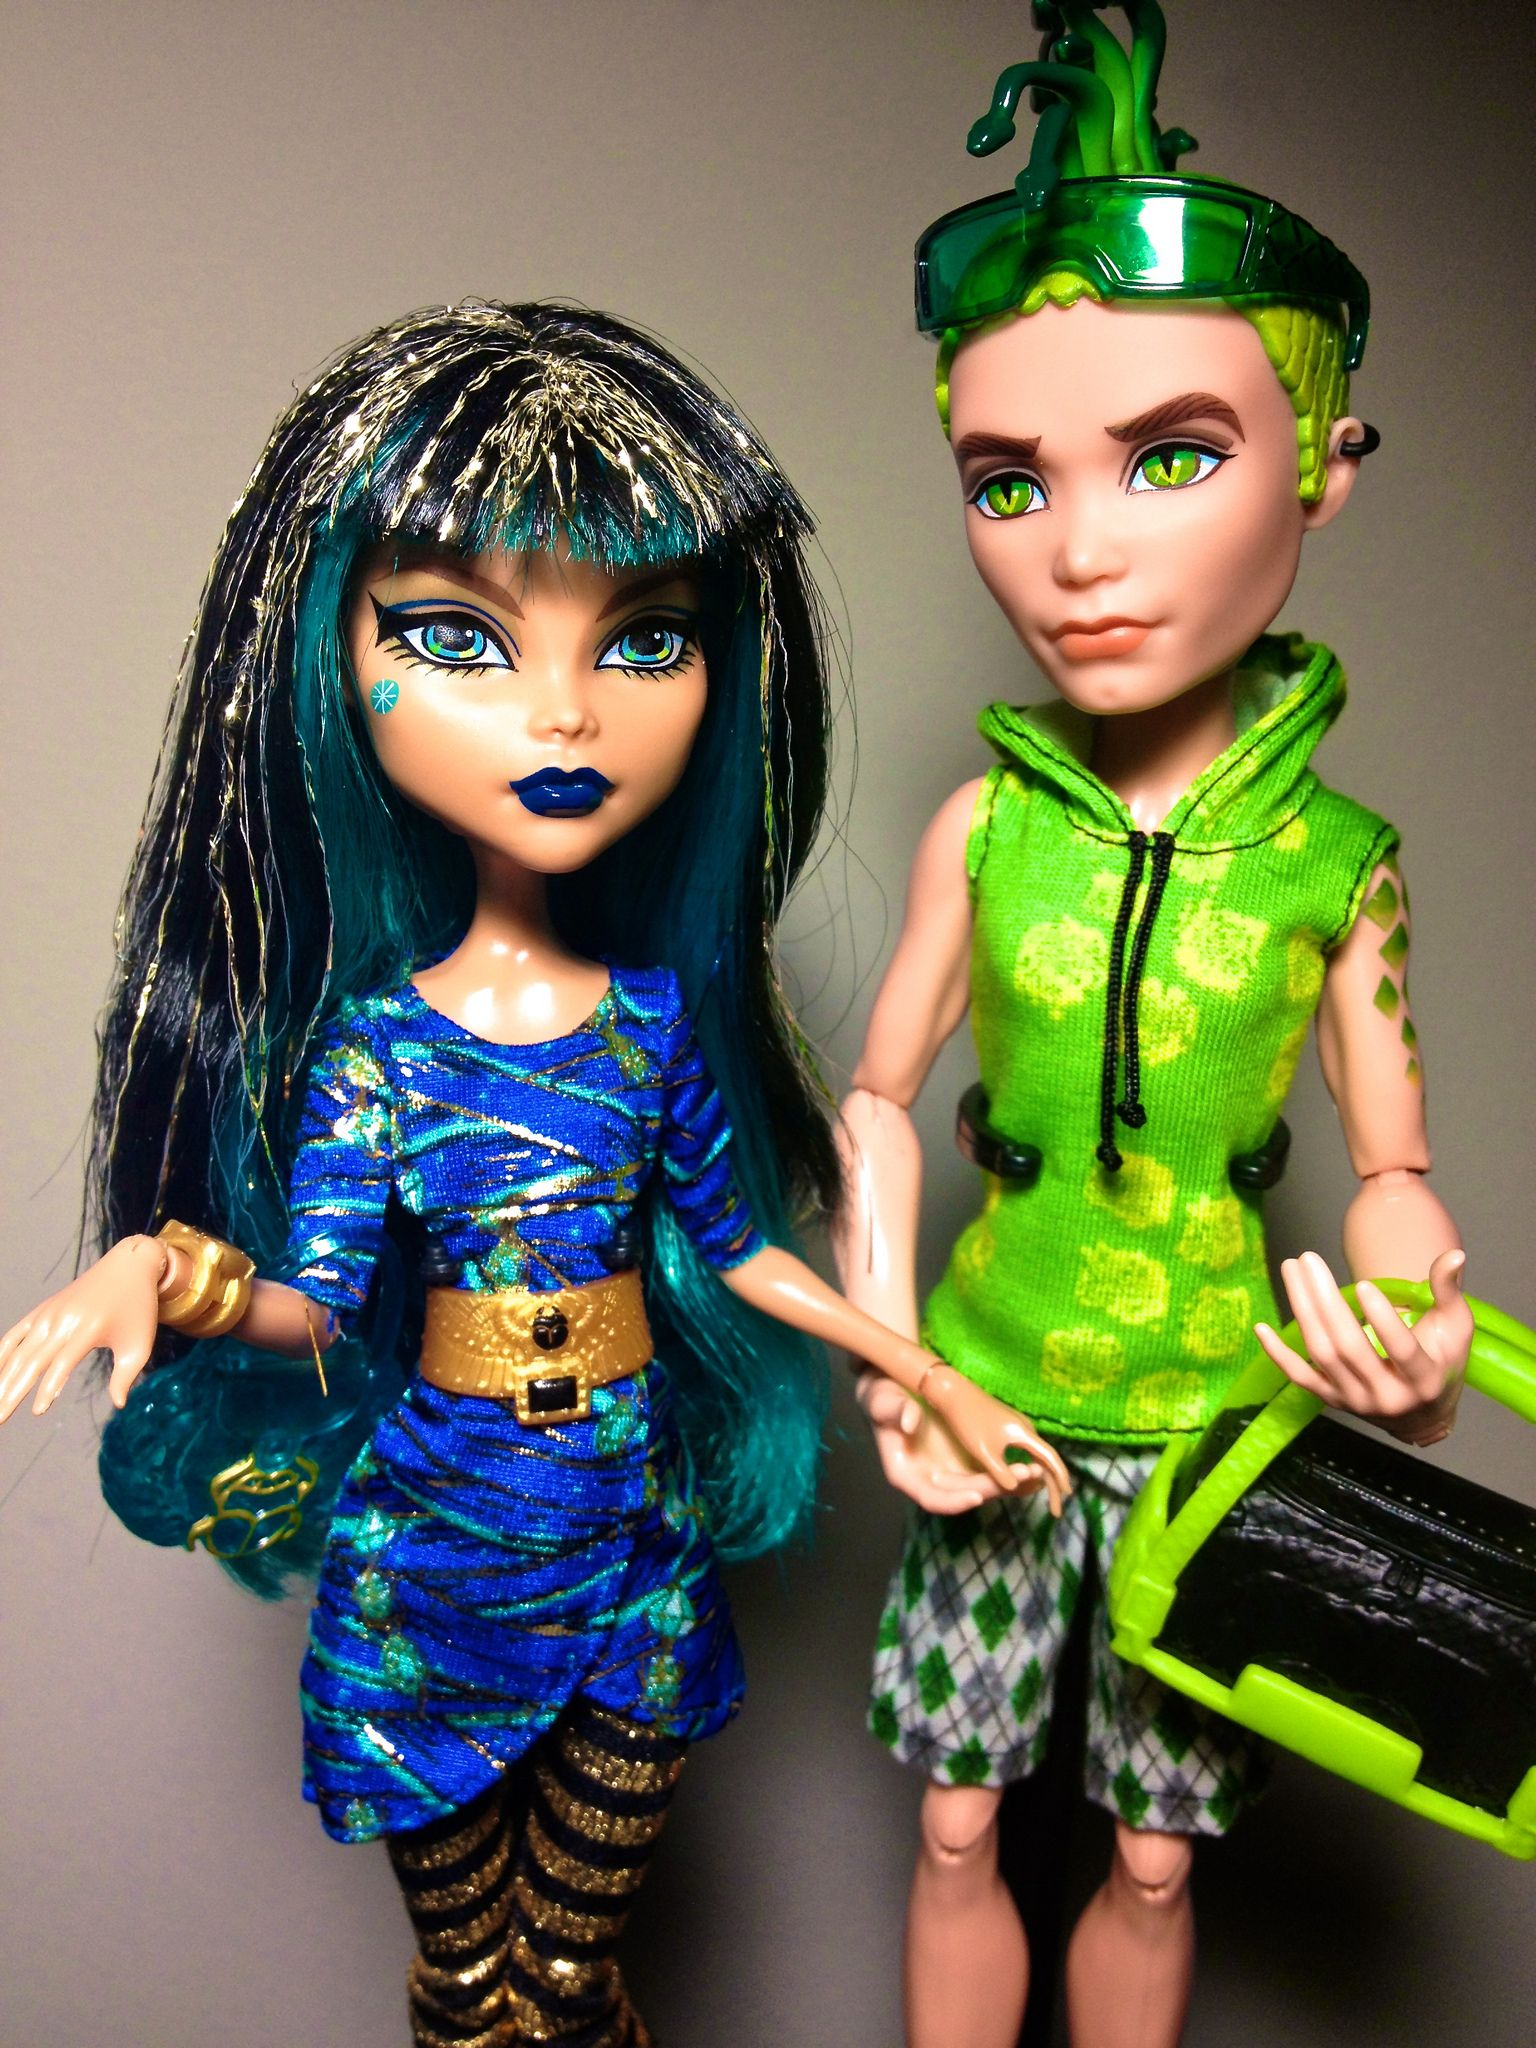 monster high dolls Cleo de Nile | Monster high pictures